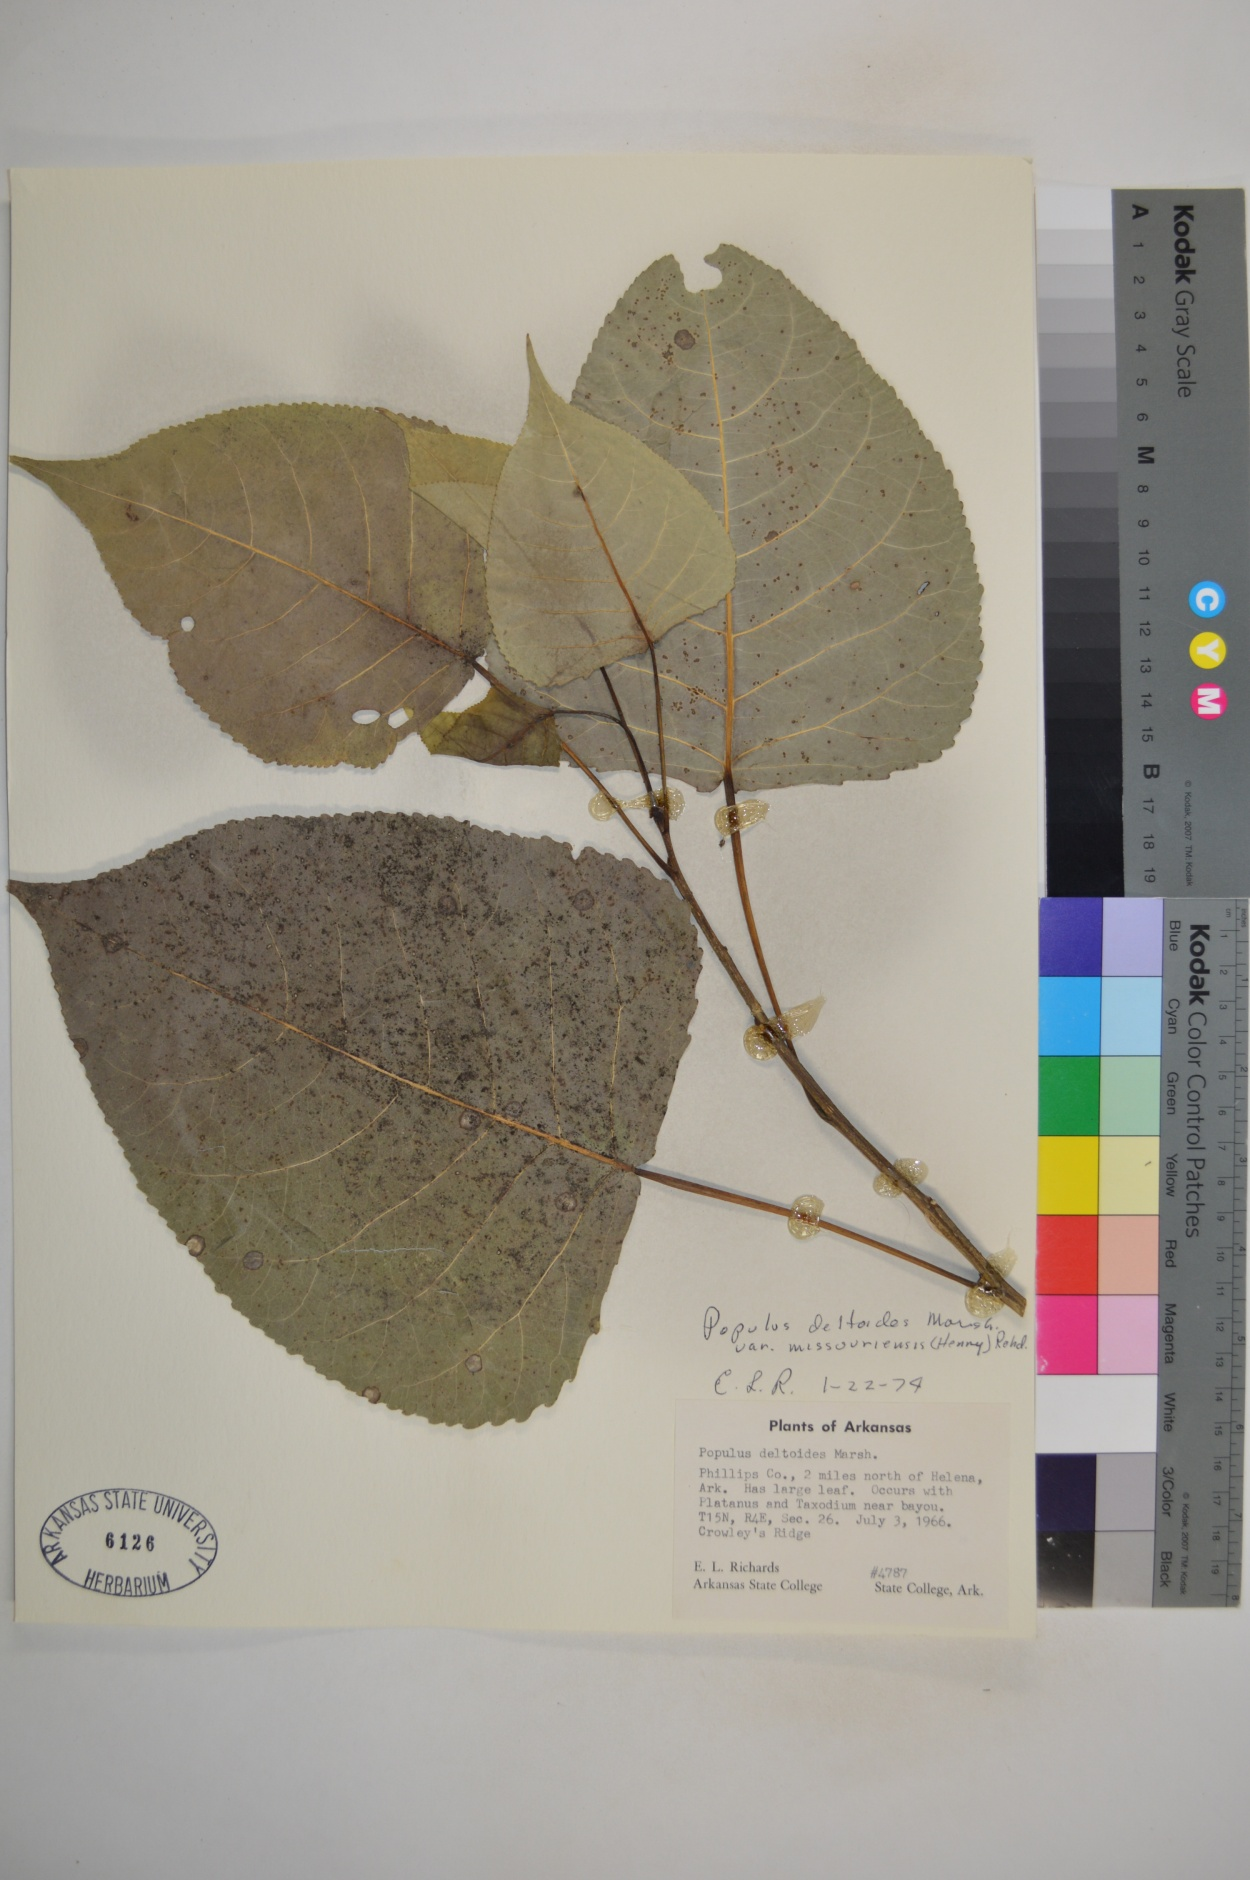 Populus deltoides var. missouriensis image